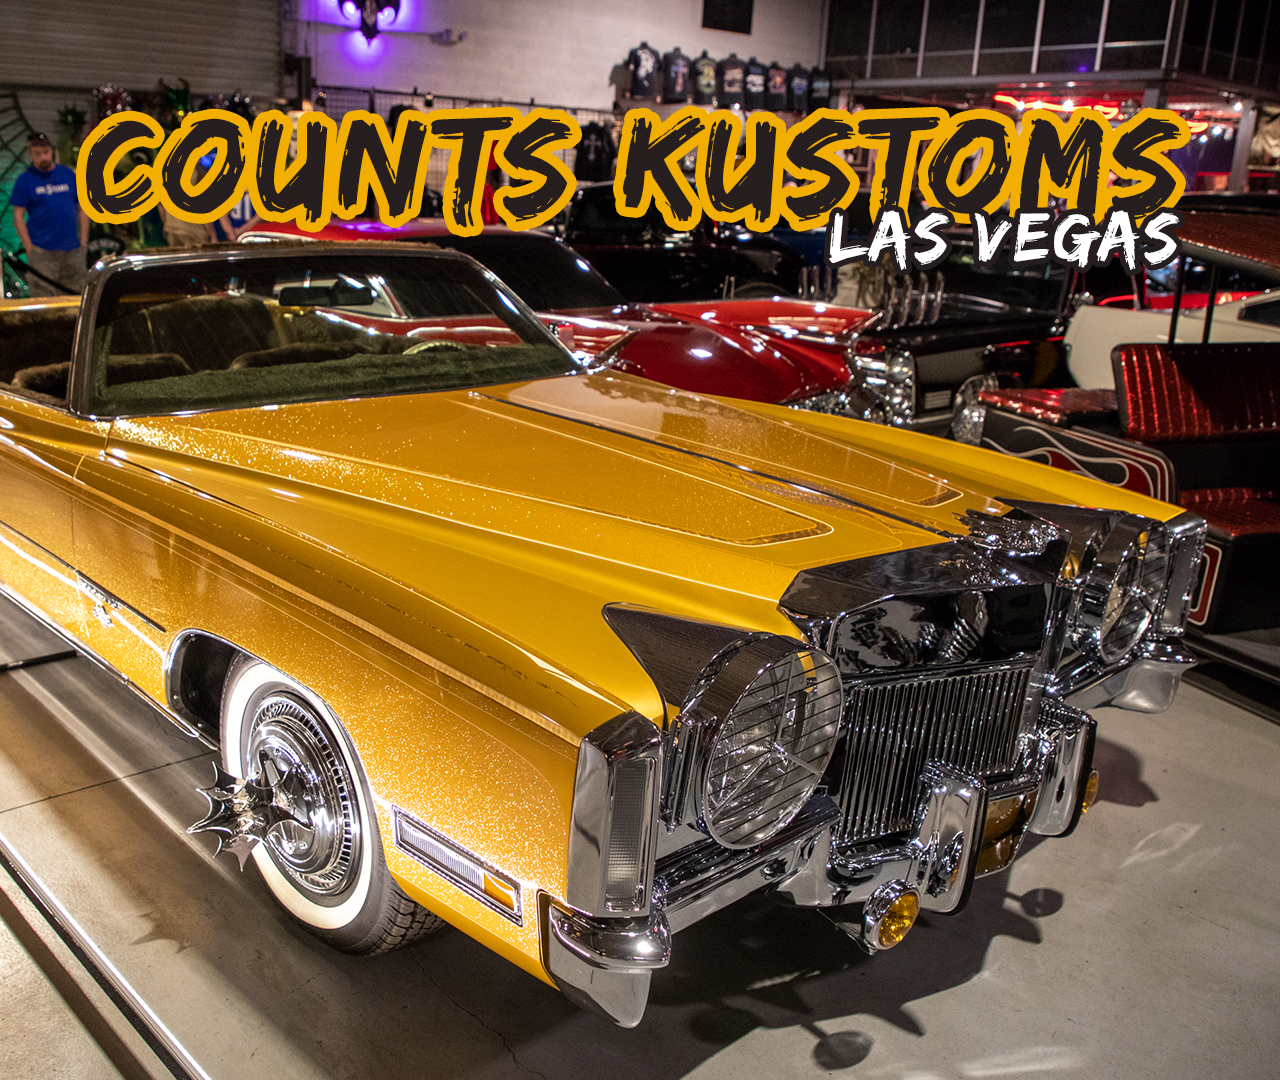 Count's Kustoms Las Vegas